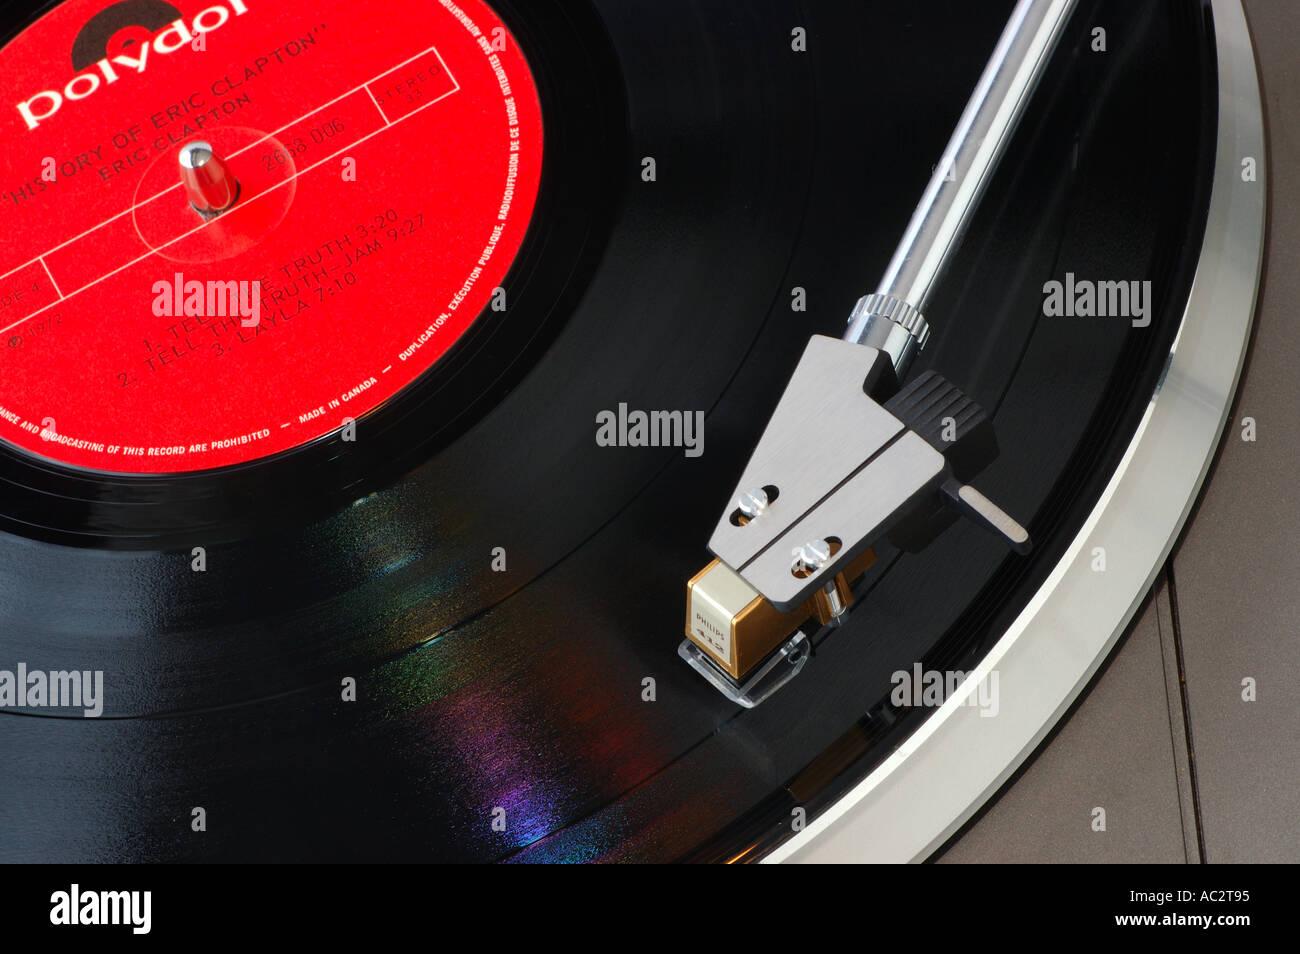 LP Musik Schallplatte auf dem Plattenteller drehen Stockbild